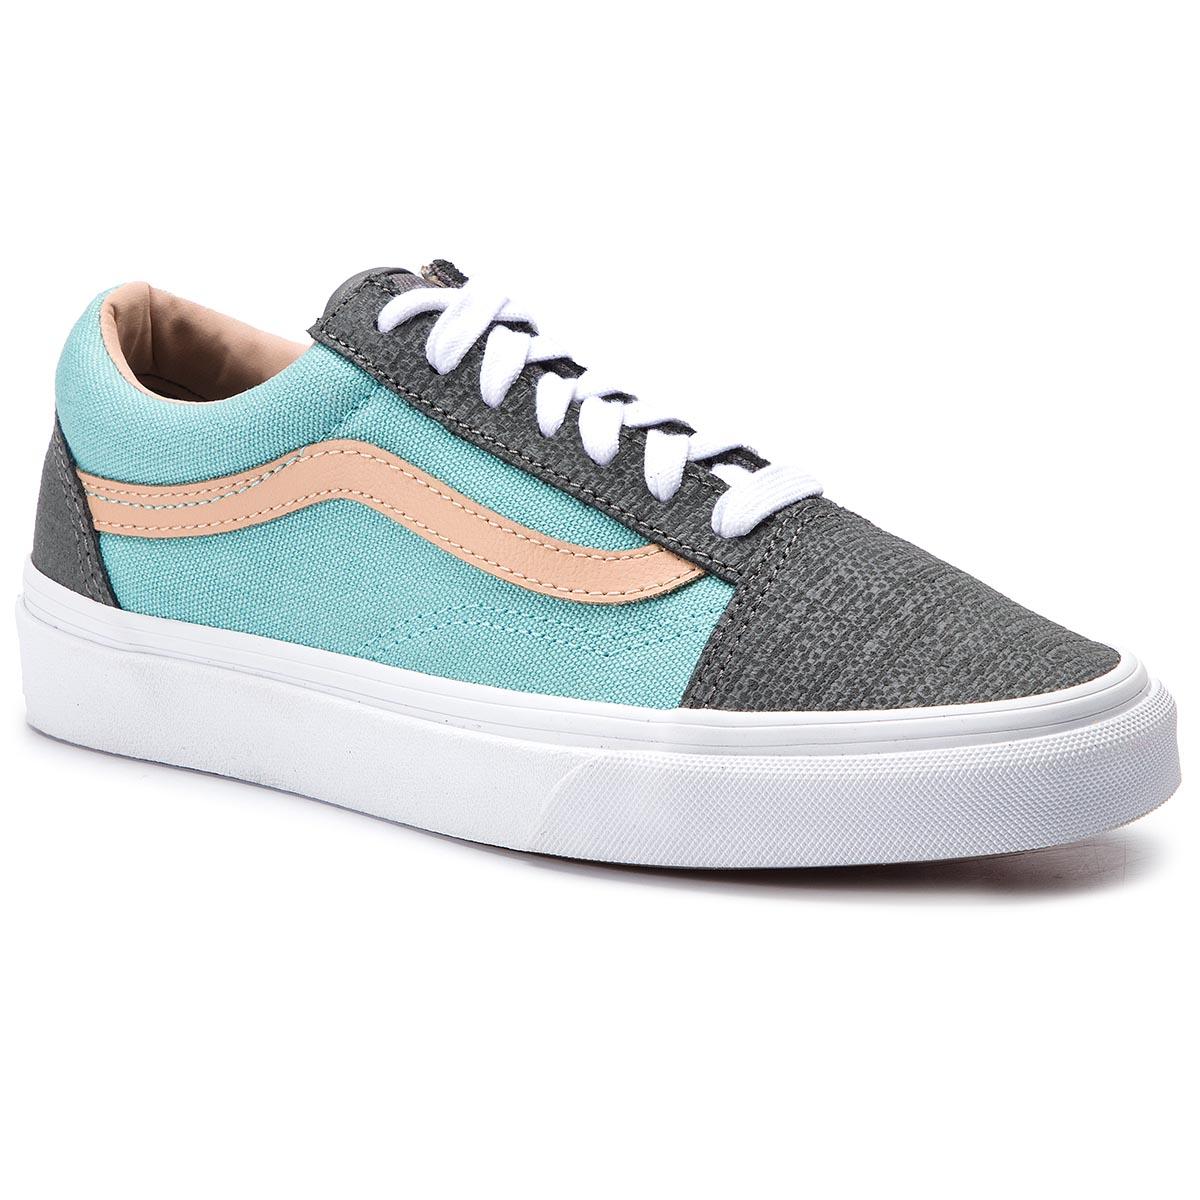 e5408e5f332 Πάνινα παπούτσια VANS - Old Skool VN0A38G1VMM1 (Textured Suede) Pewter/A